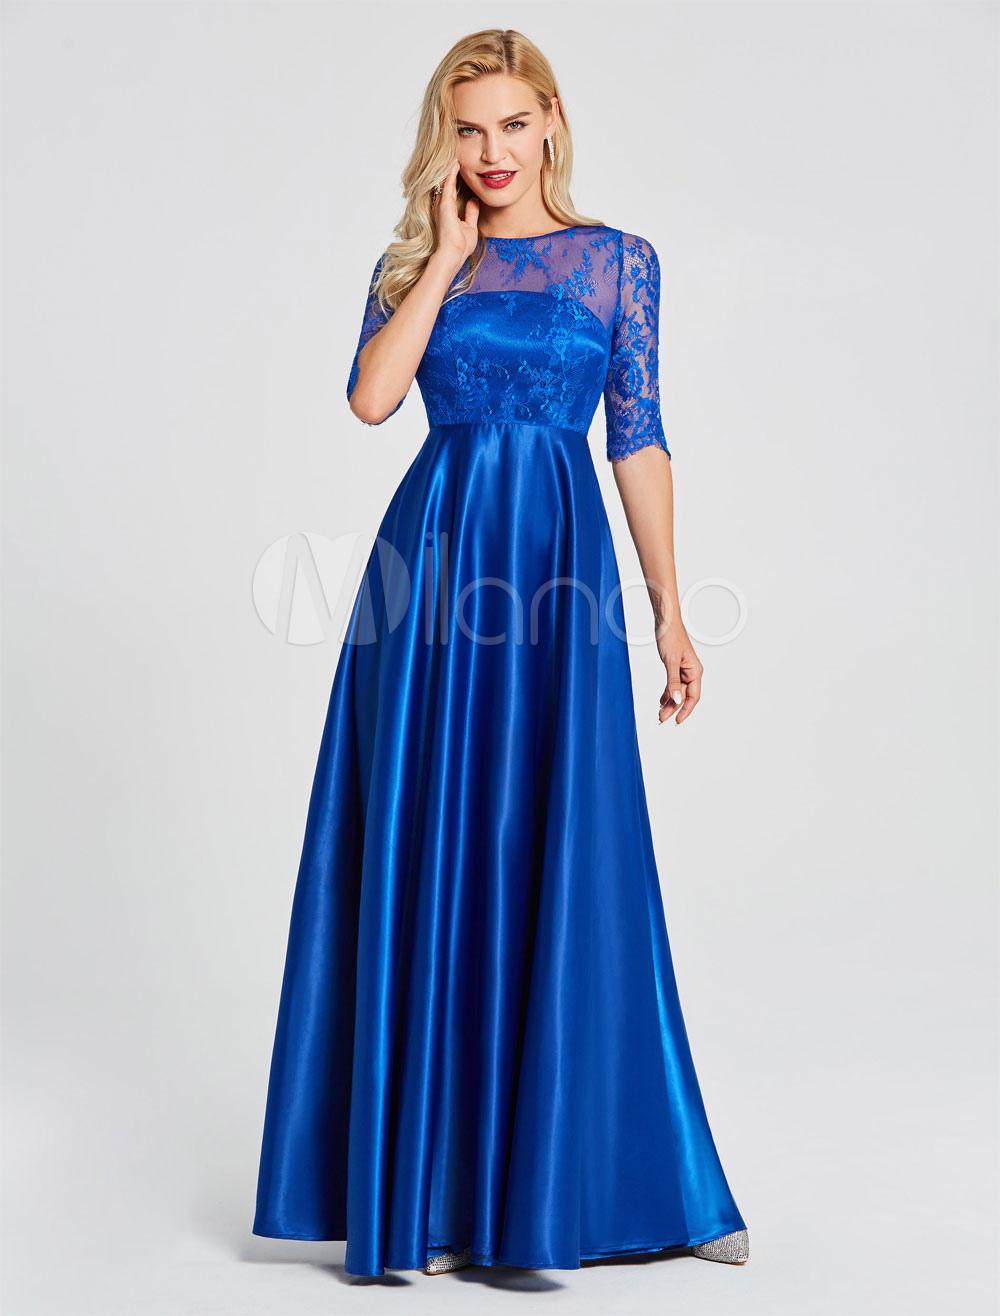 Evening Dresses Royal Blue Half Sleeve Lace Illusion V Back Elastic Satin Floor Length Formal Gowns